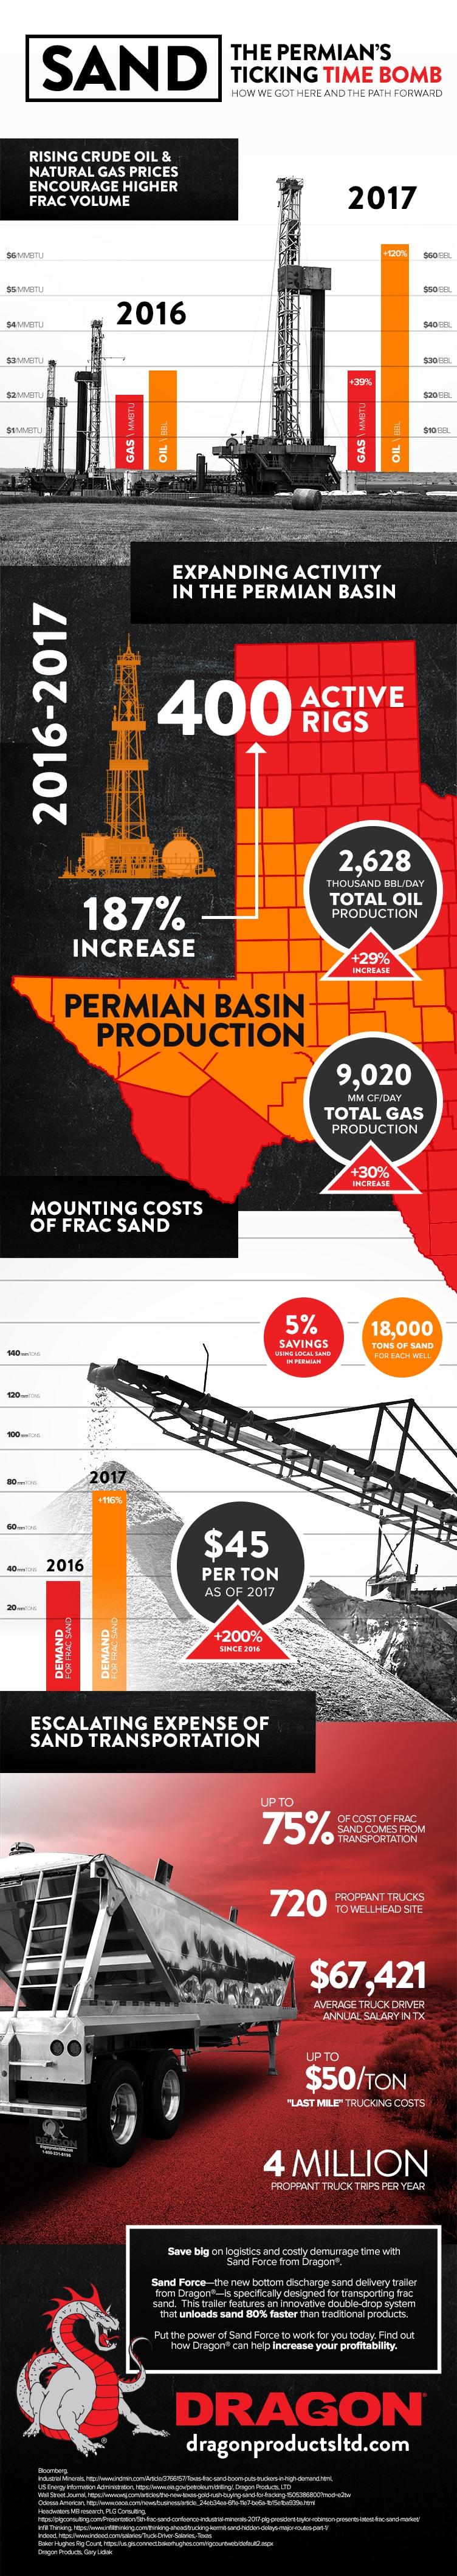 Frac Sand Permian Basin Infographic